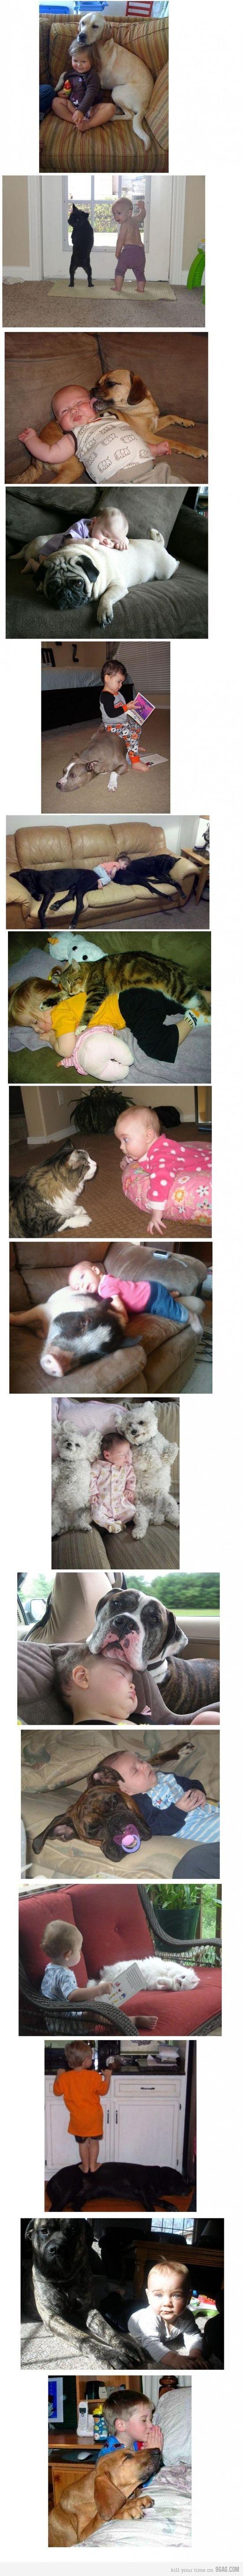 love animals tooo much